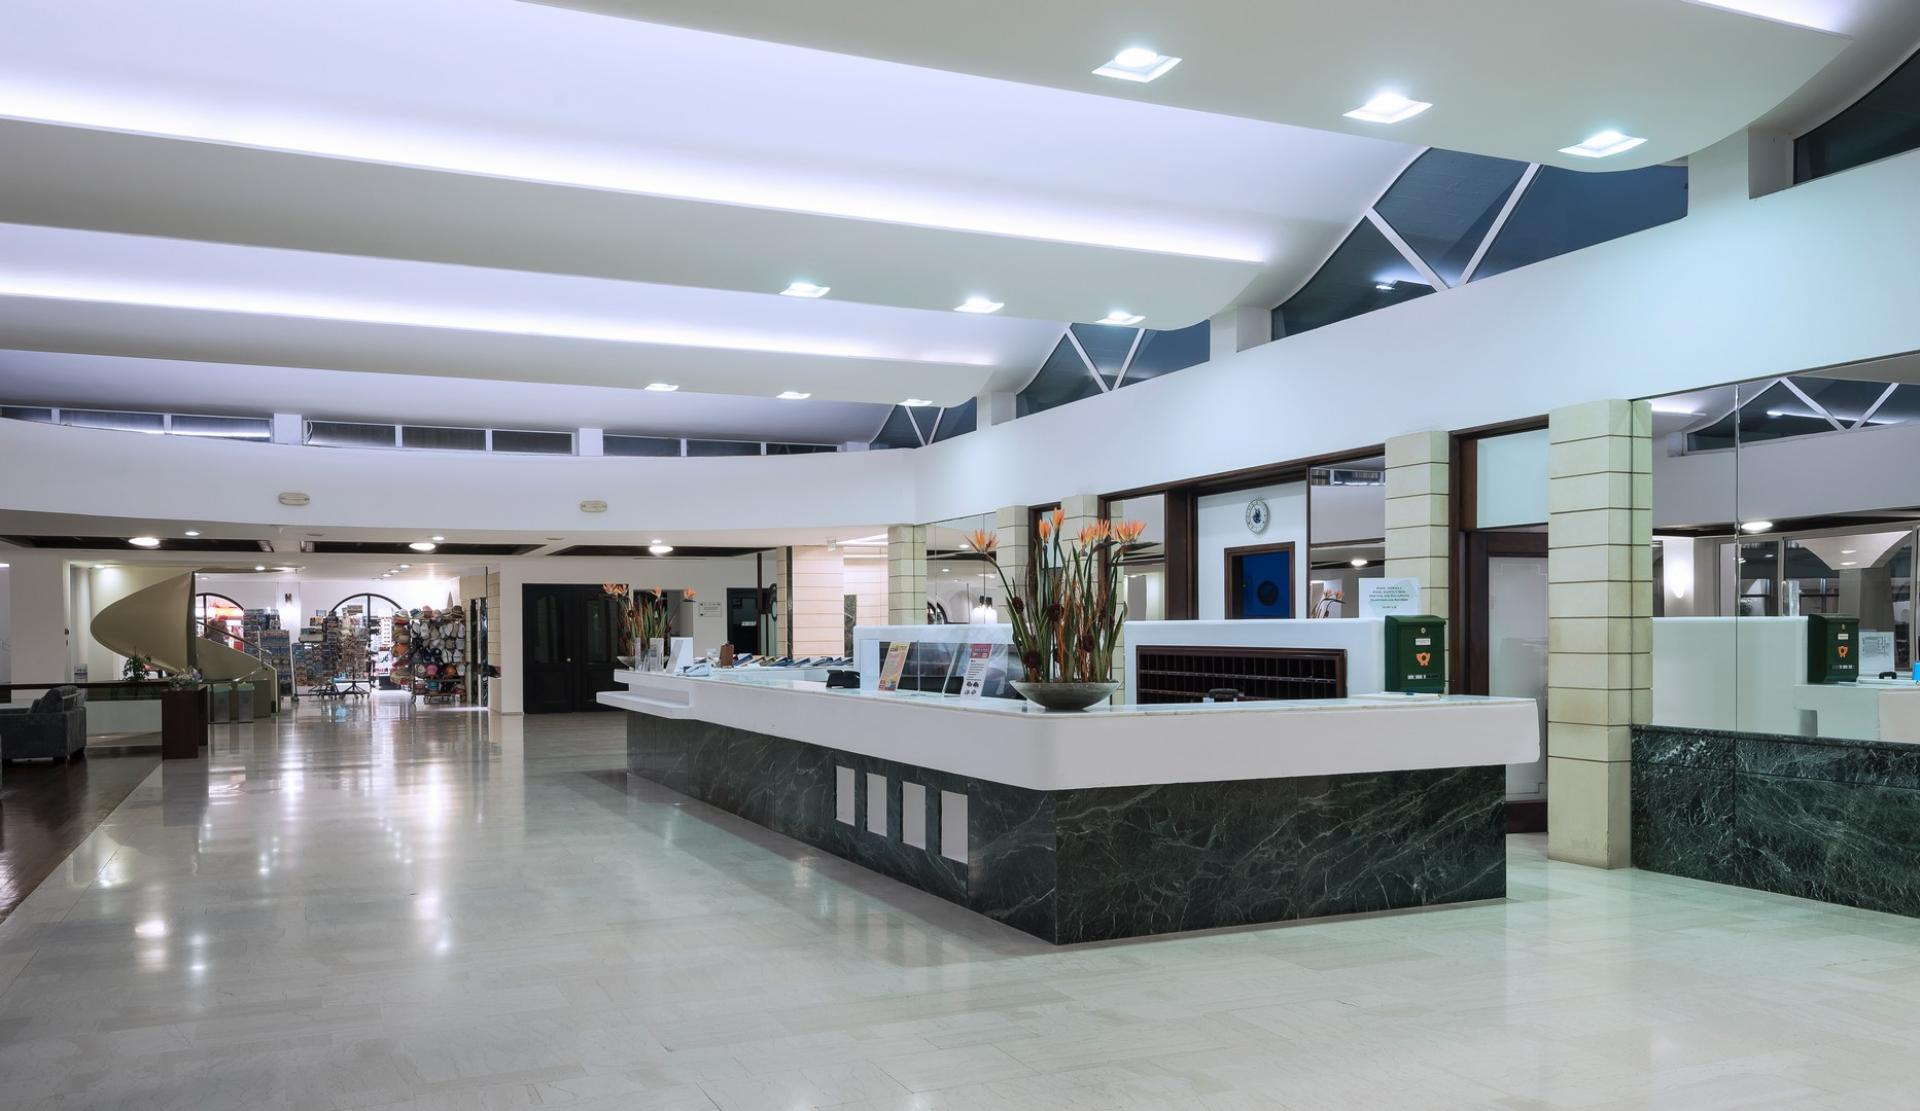 Lobby - Indoor